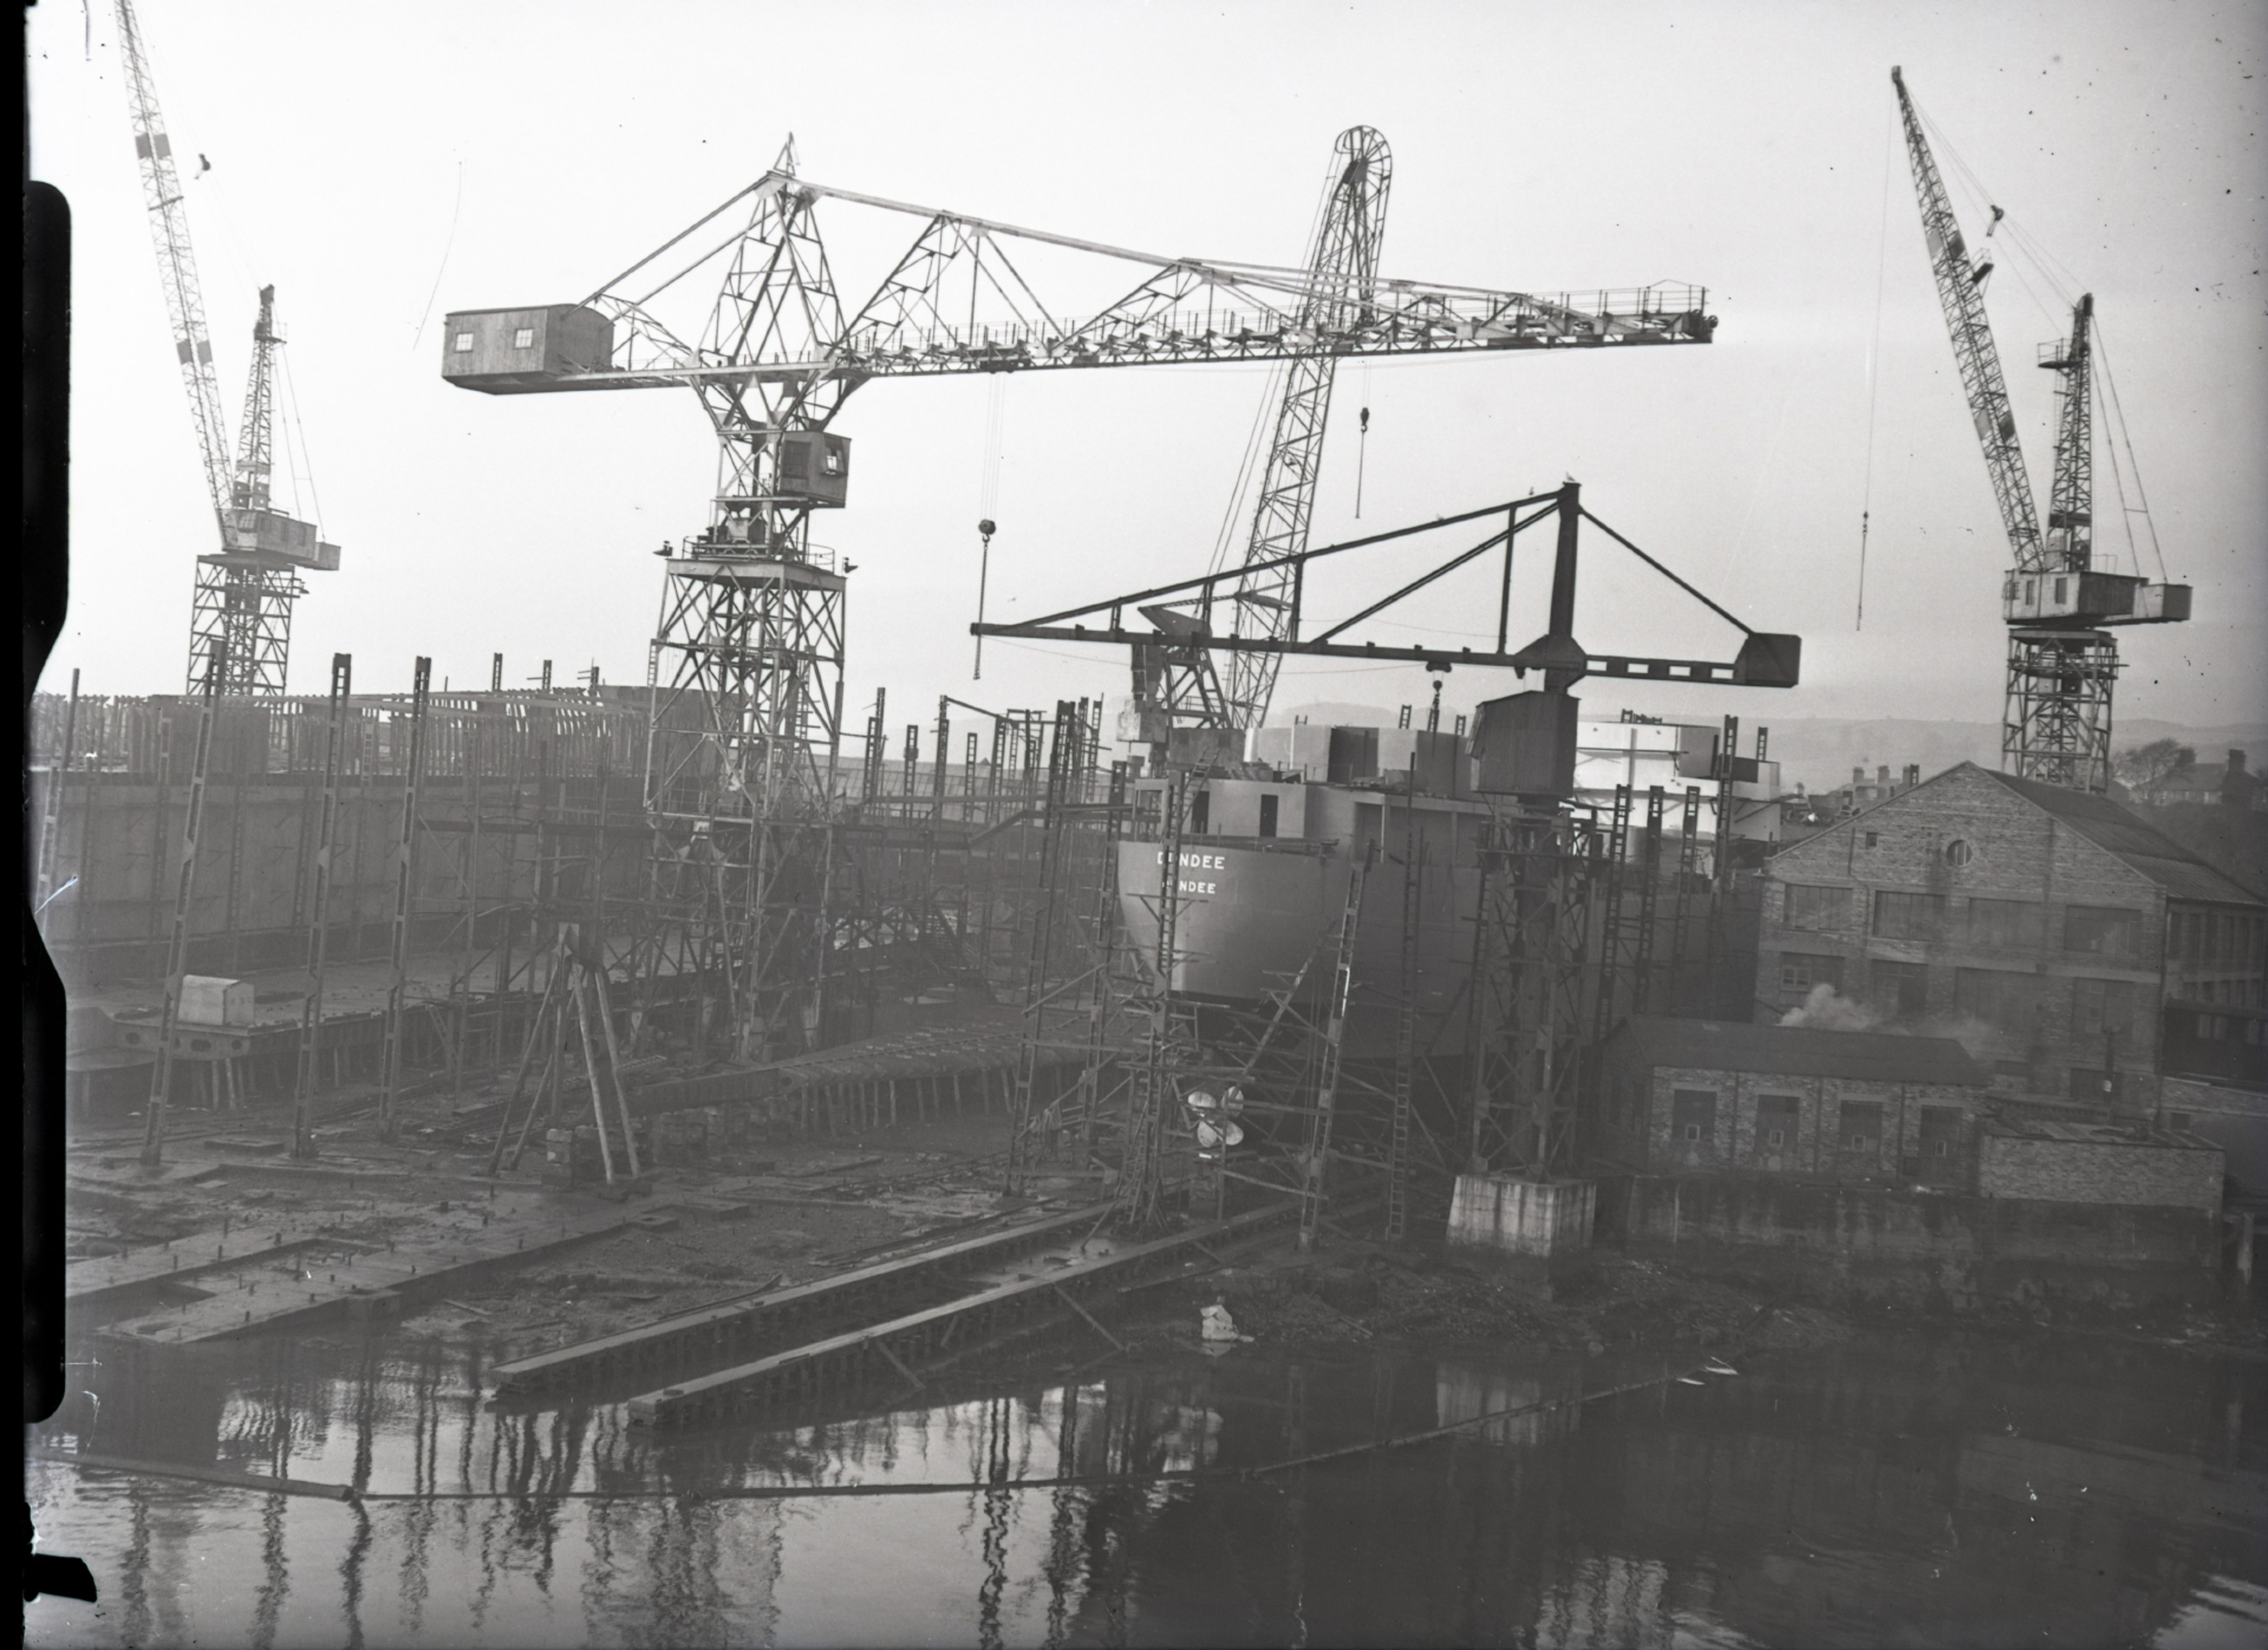 Burntisland Shipbuilding Yard in 1953.